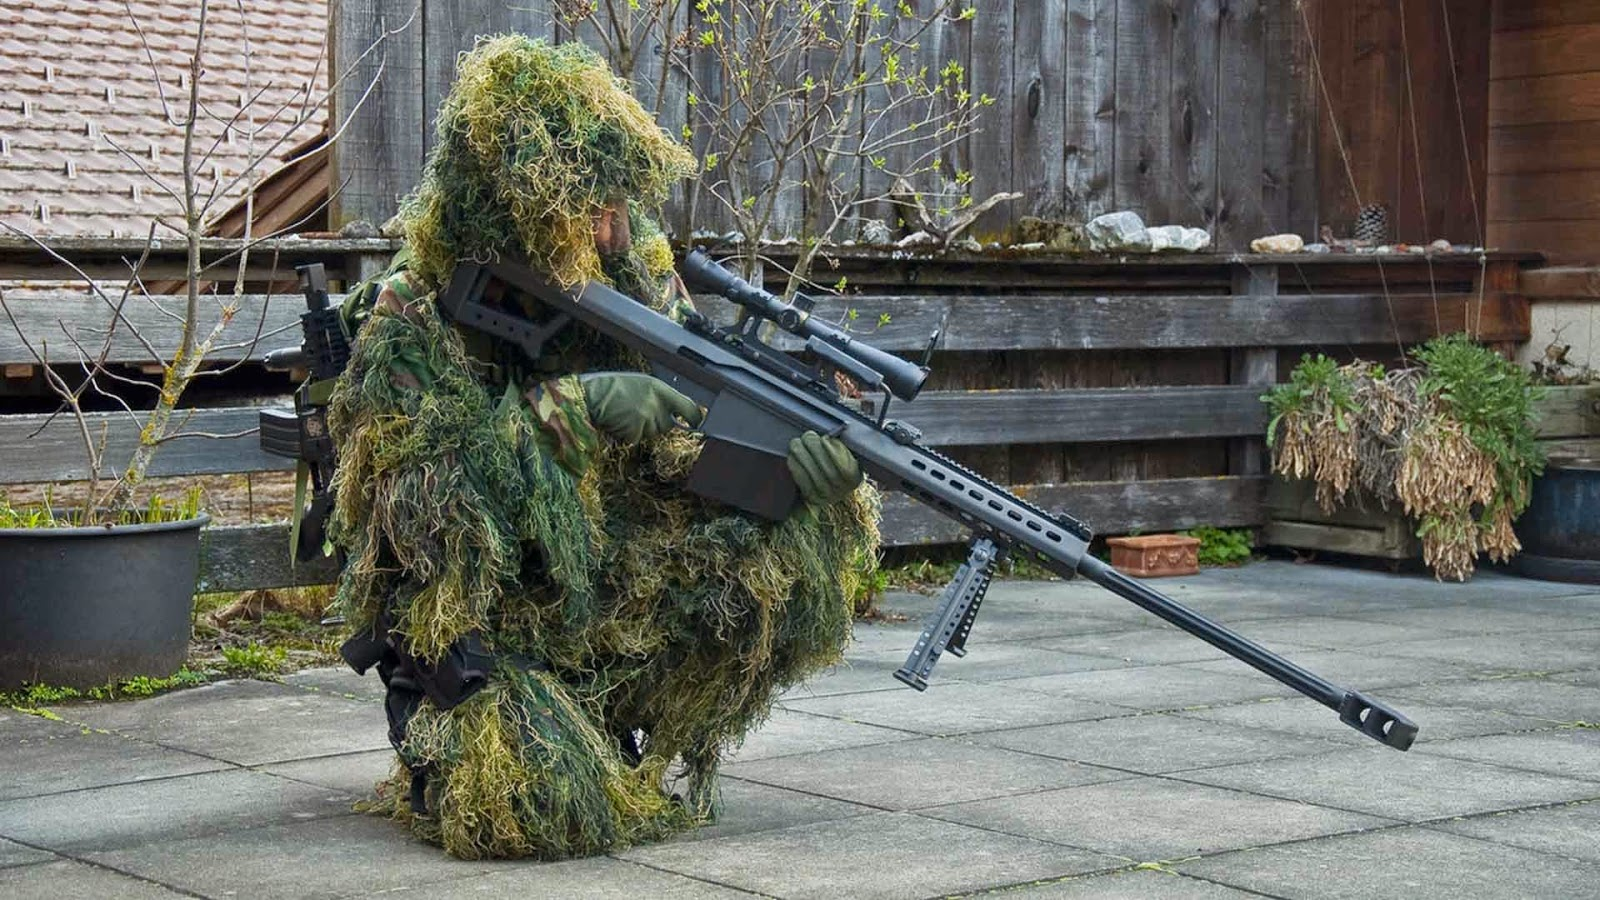 Sniper Rifles HD Wallpapers By PCbots PCbots Blog 1600x900